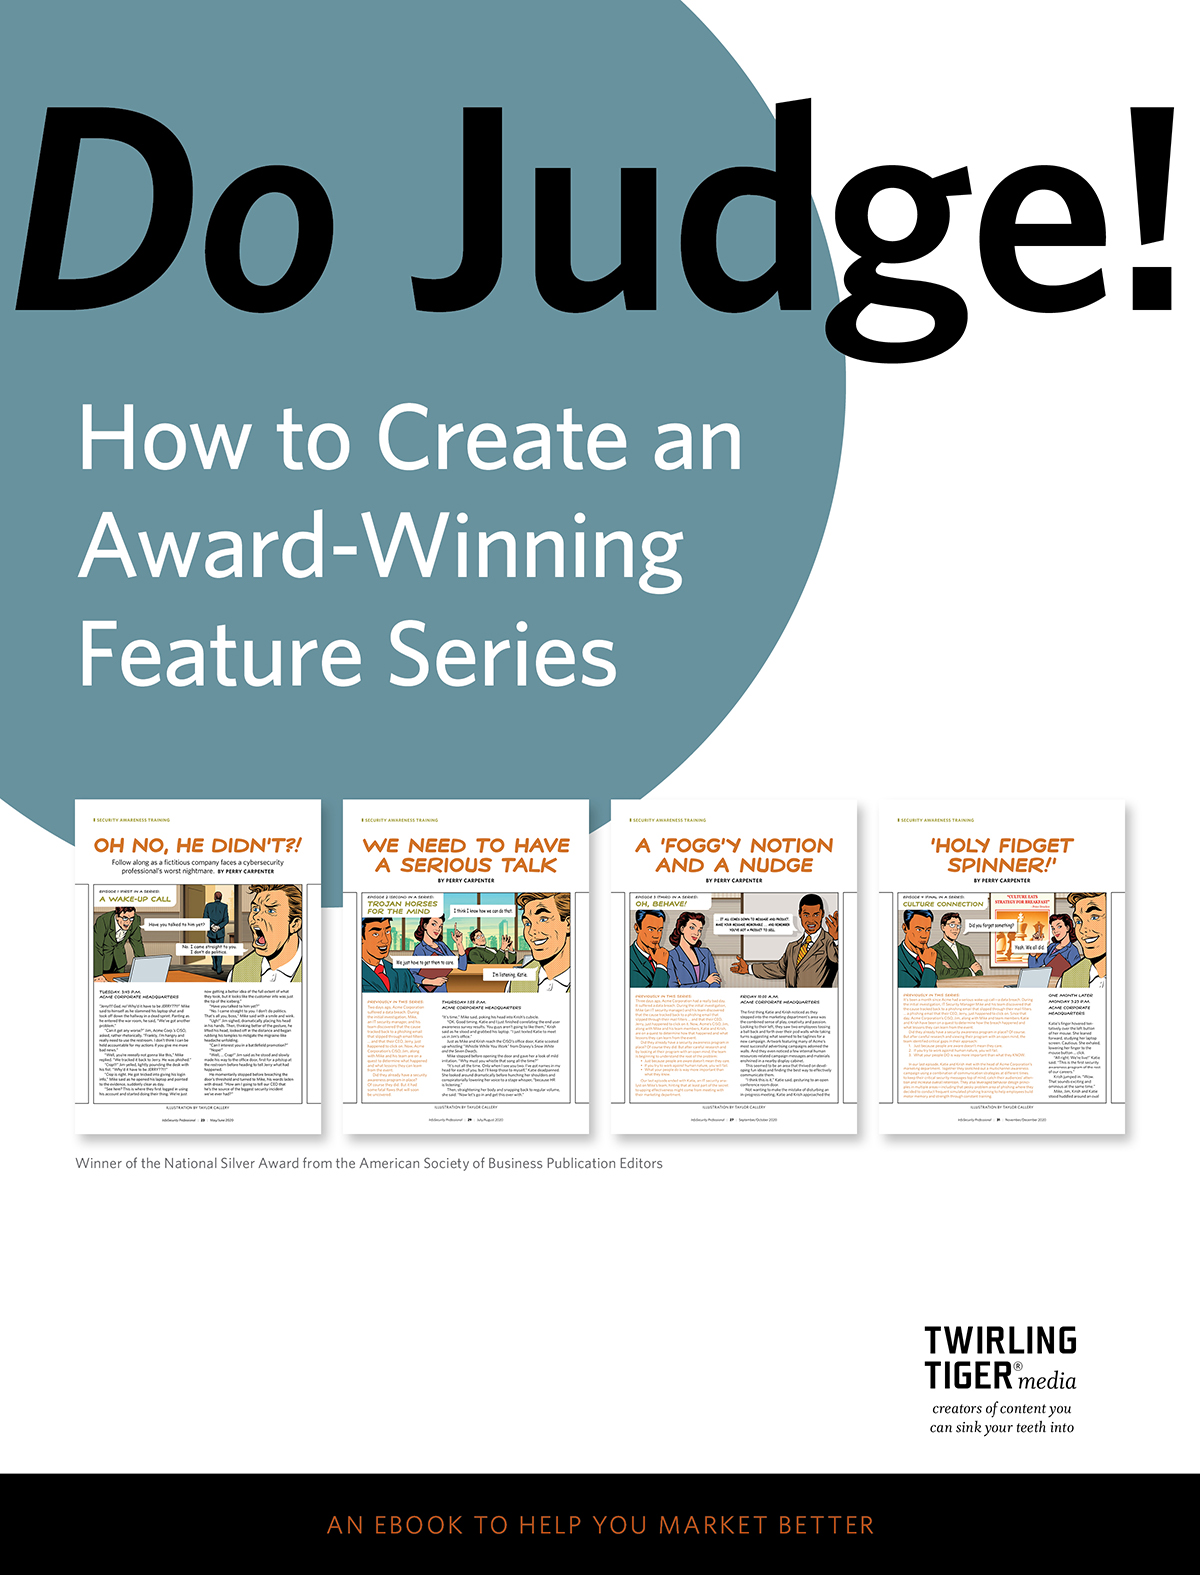 Ebook_ How to Create an Award-Winning Feature Series